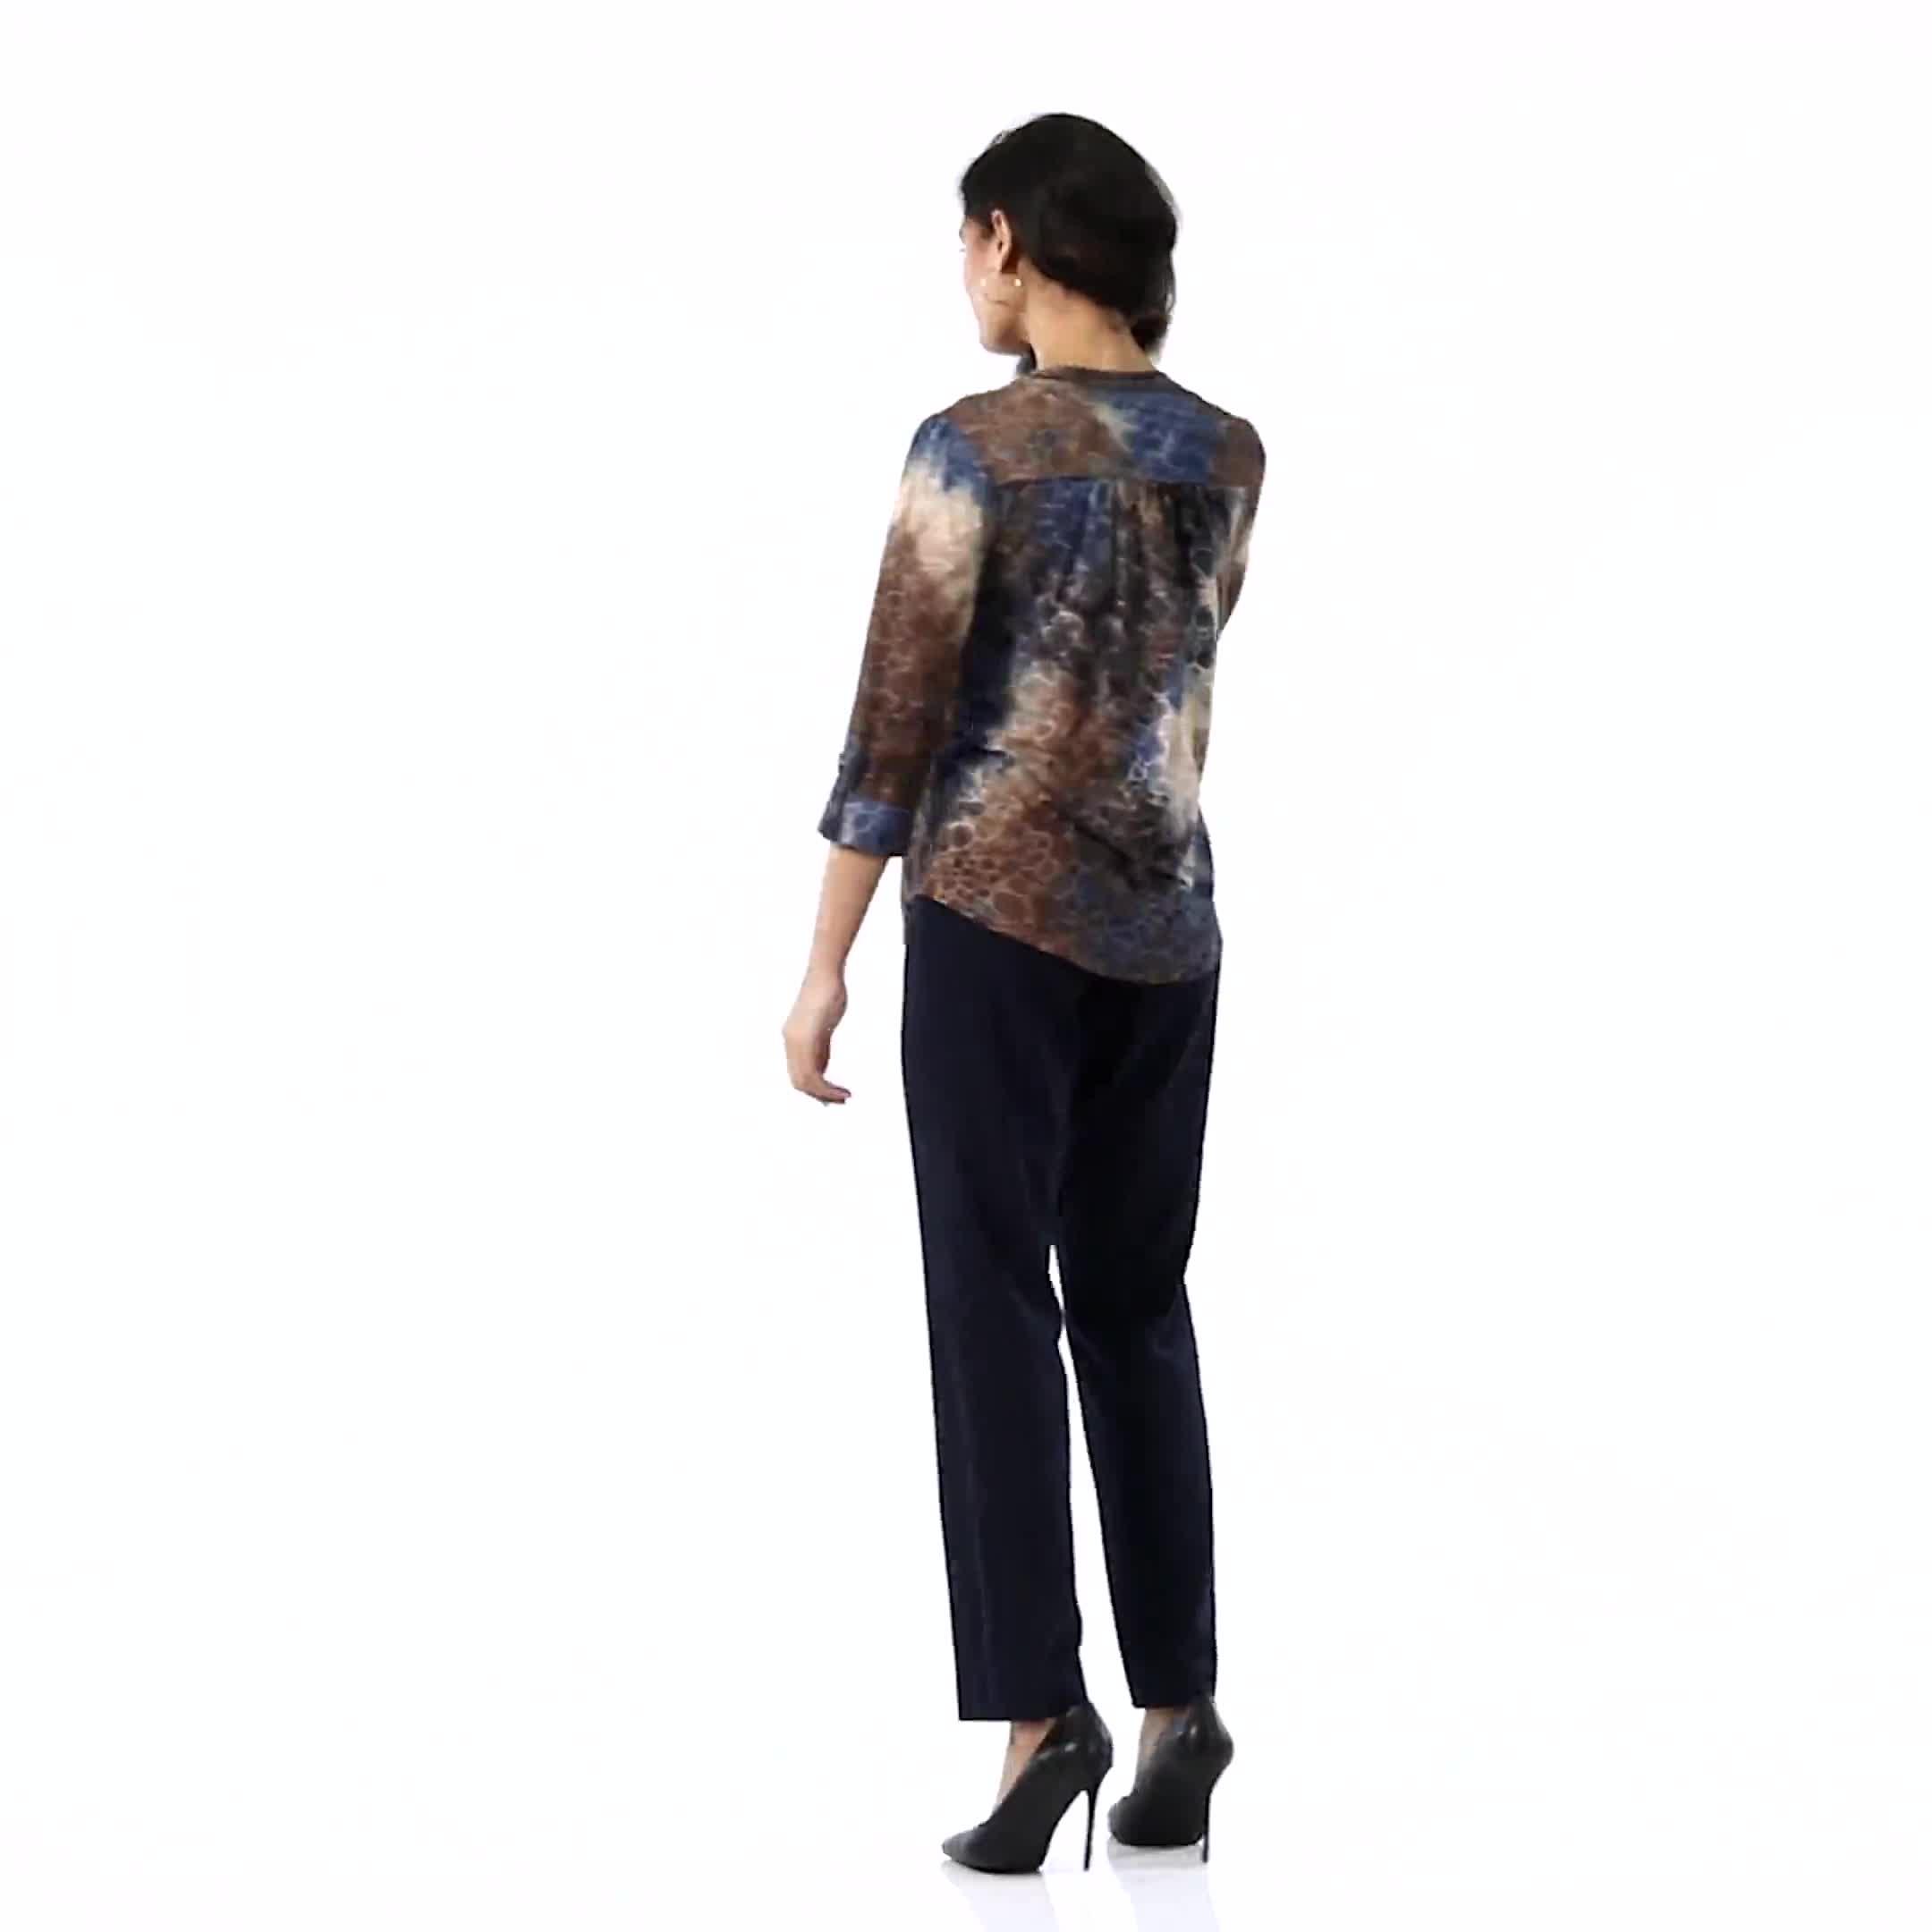 Roz & Ali Secret Agent Pull On Tummy Control Pants with L Pockets - Petite - Video